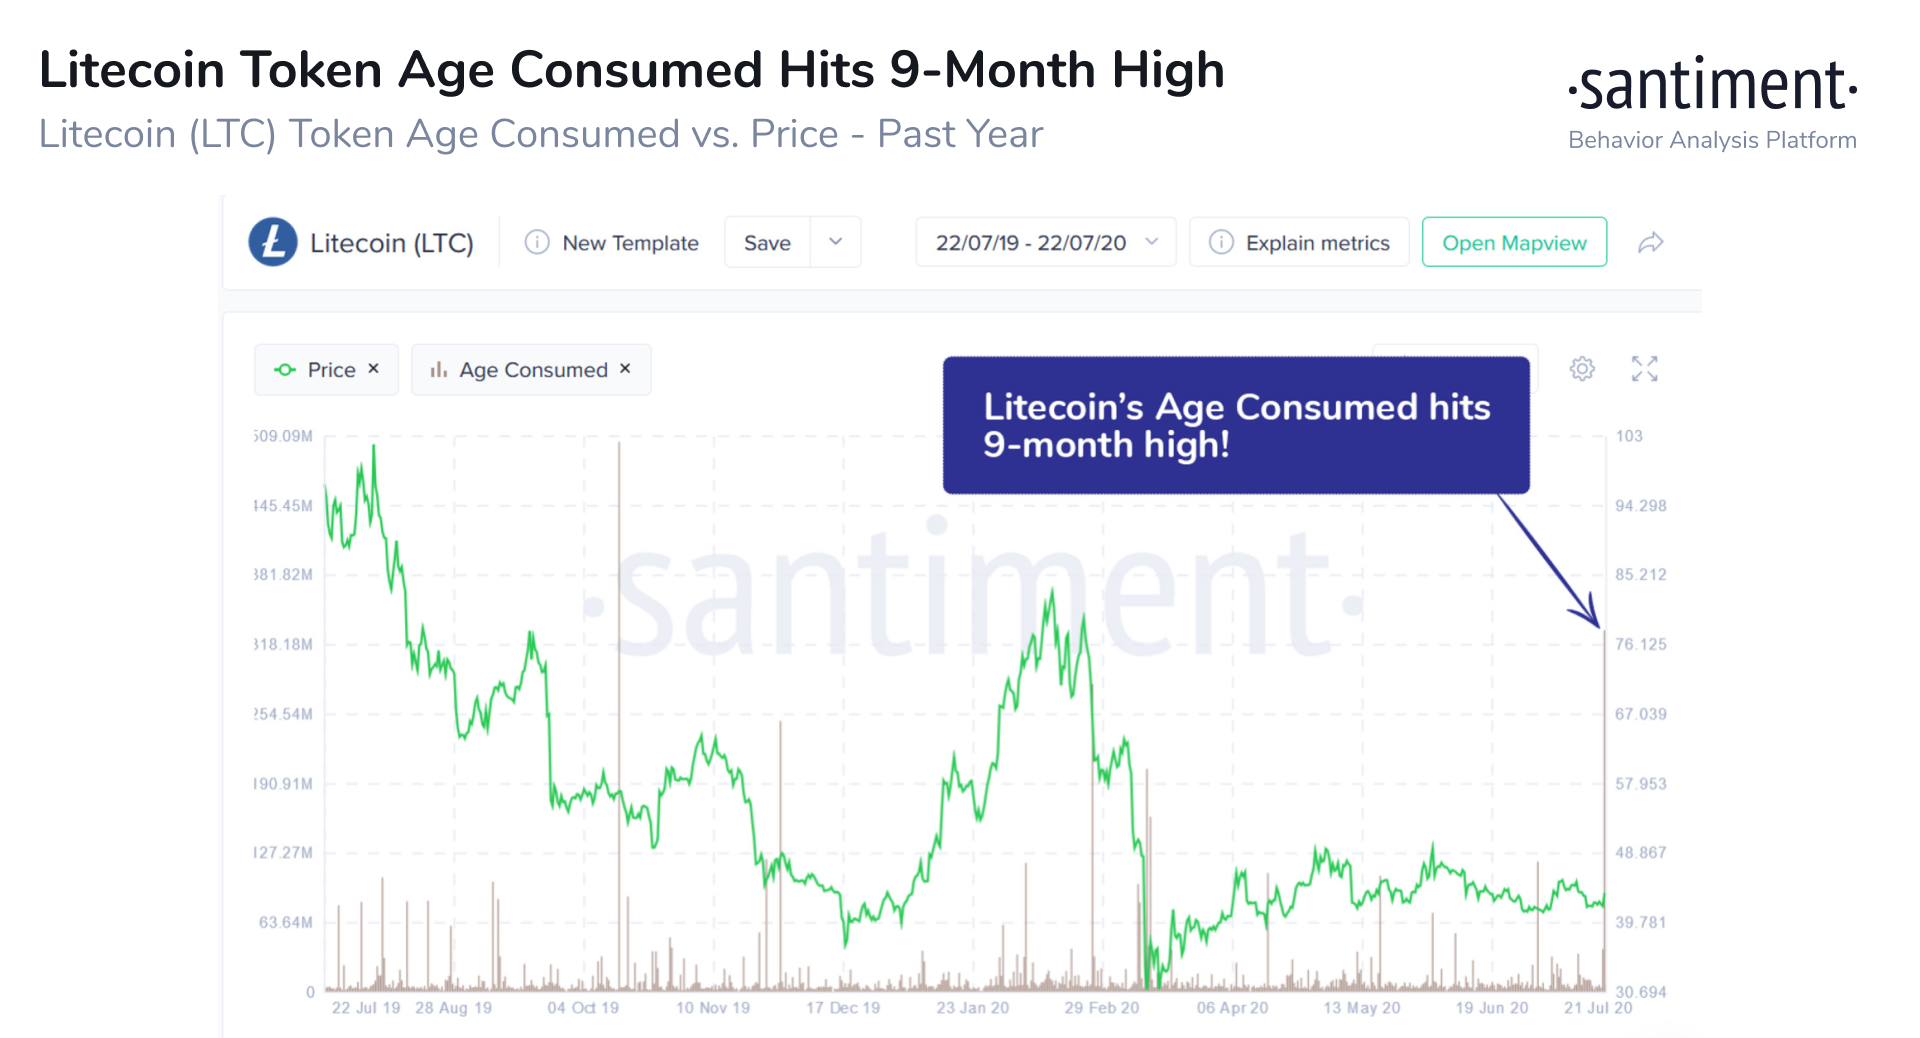 Litecoin's Token Age Consumed